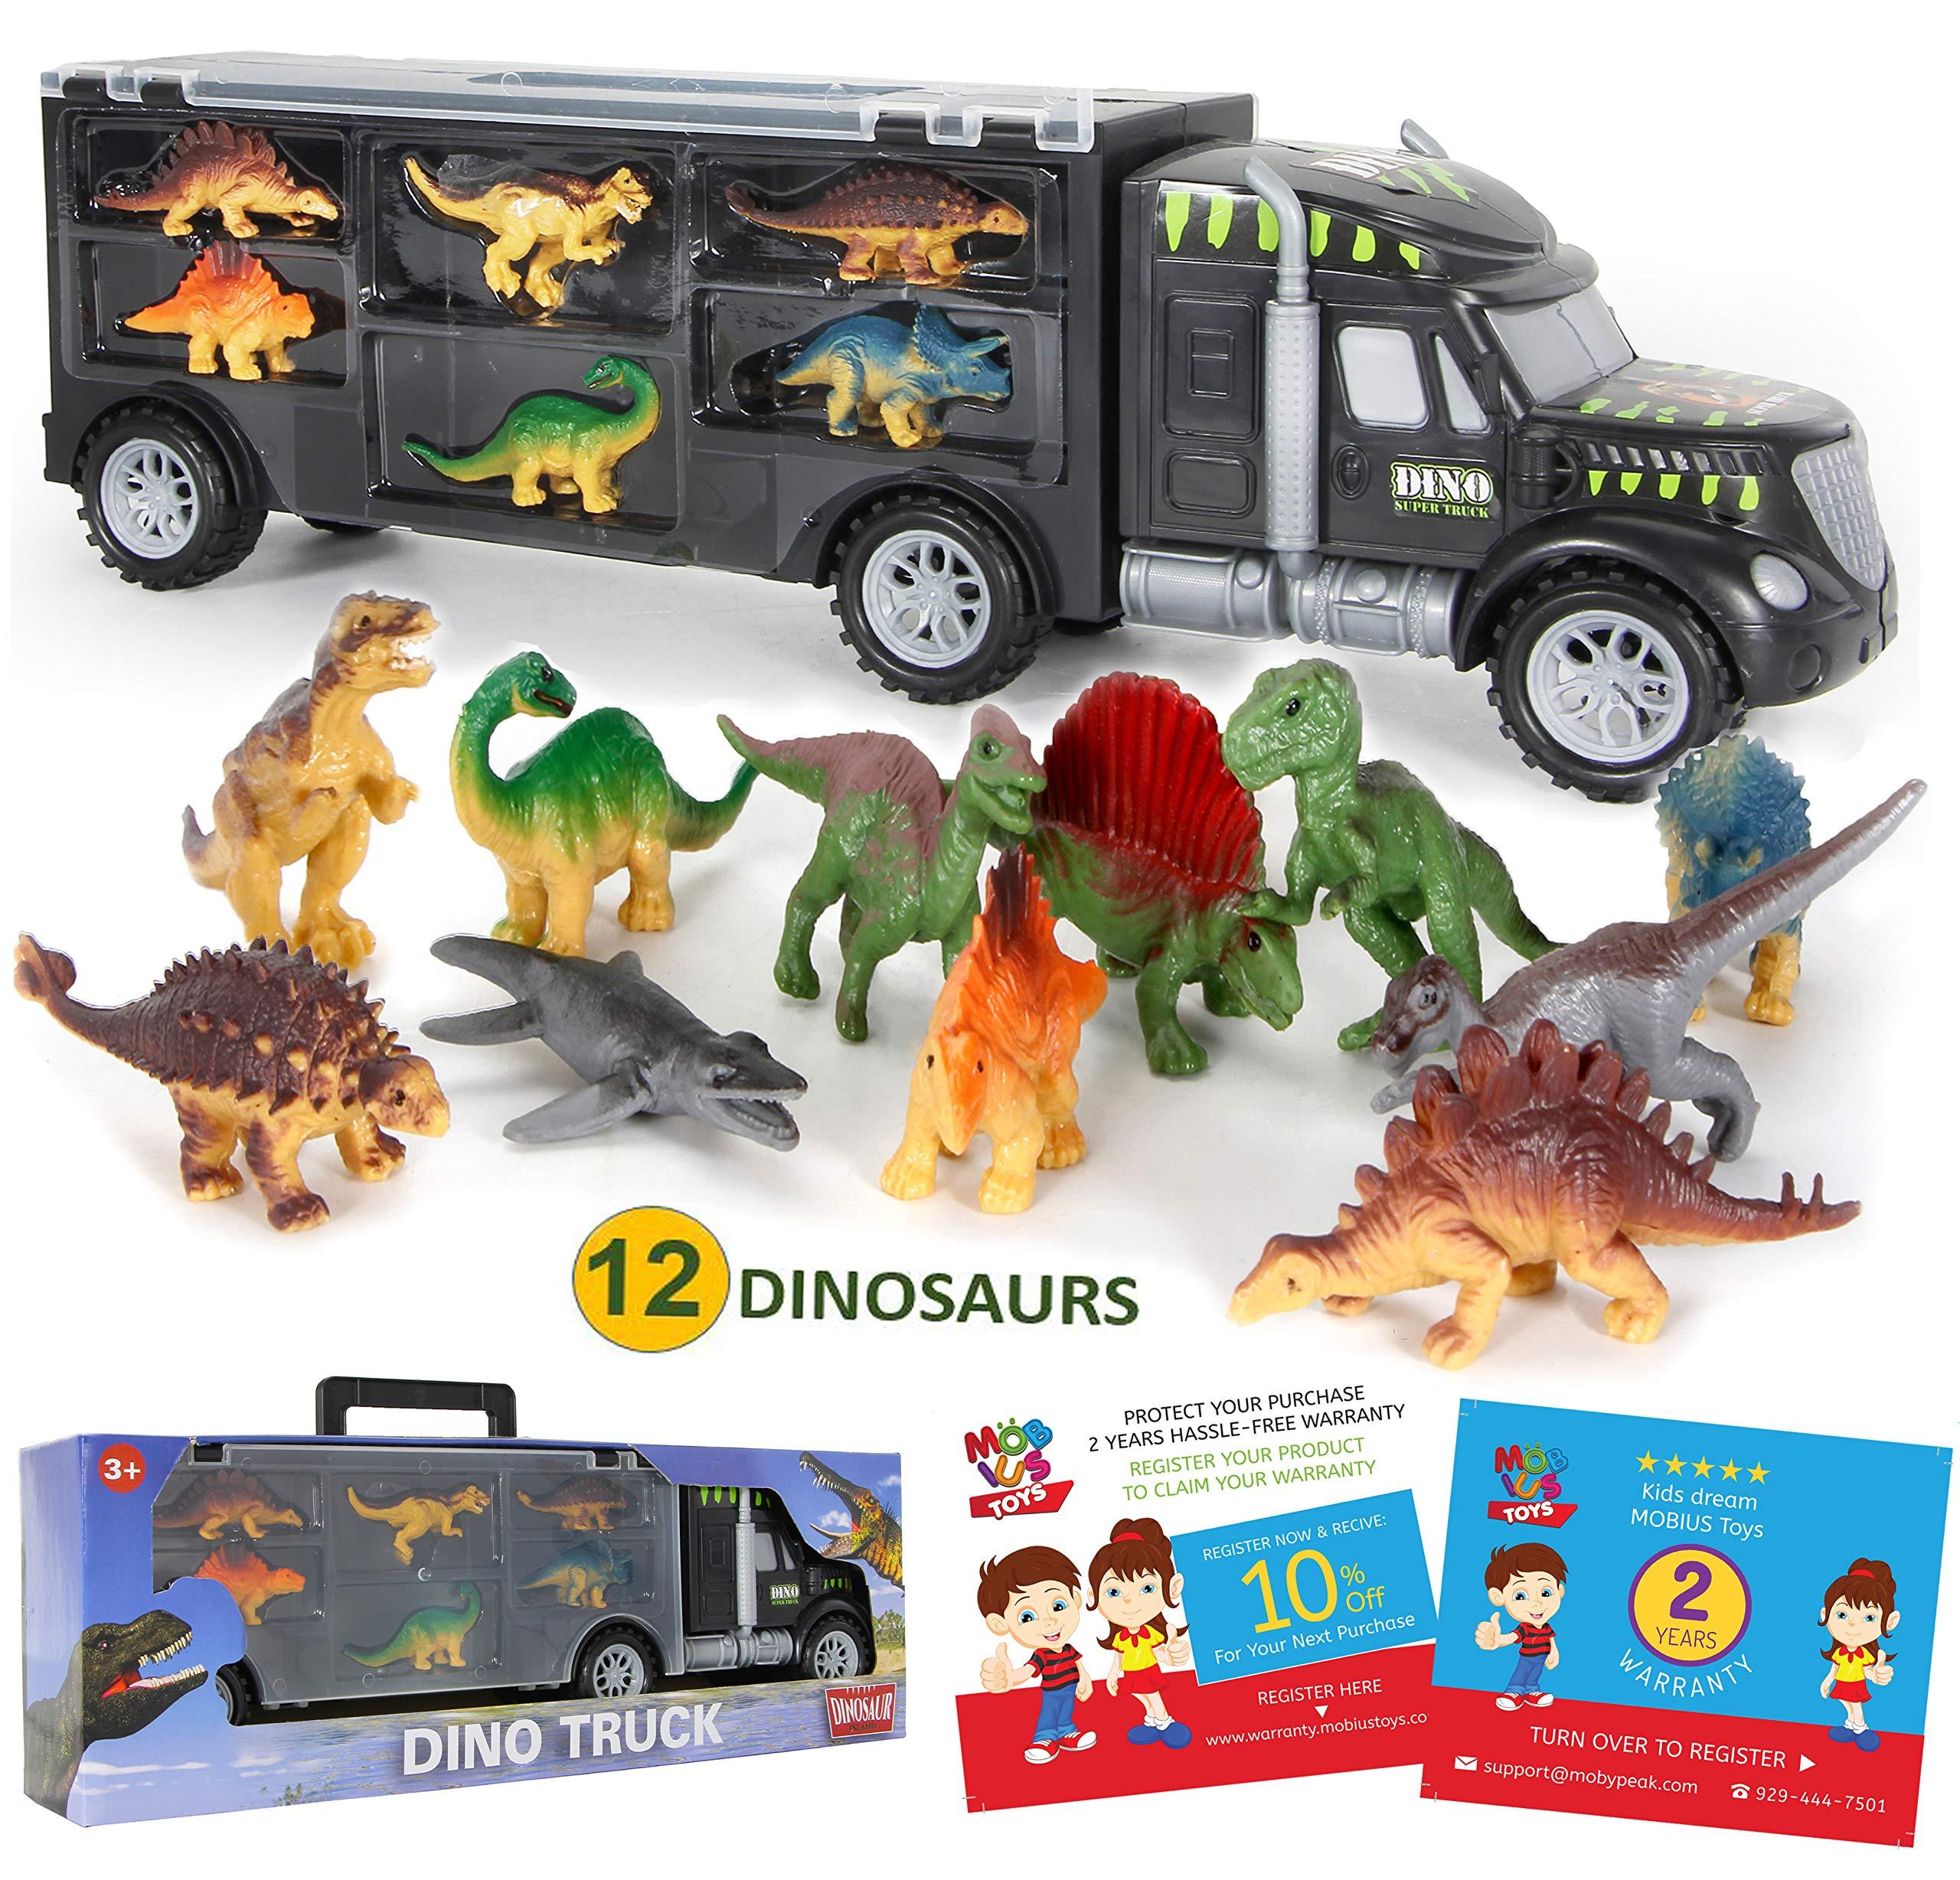 Dinosaur Truck Carrier 12 Toy Dinosaur Buy Online In Brunei At Desertcart